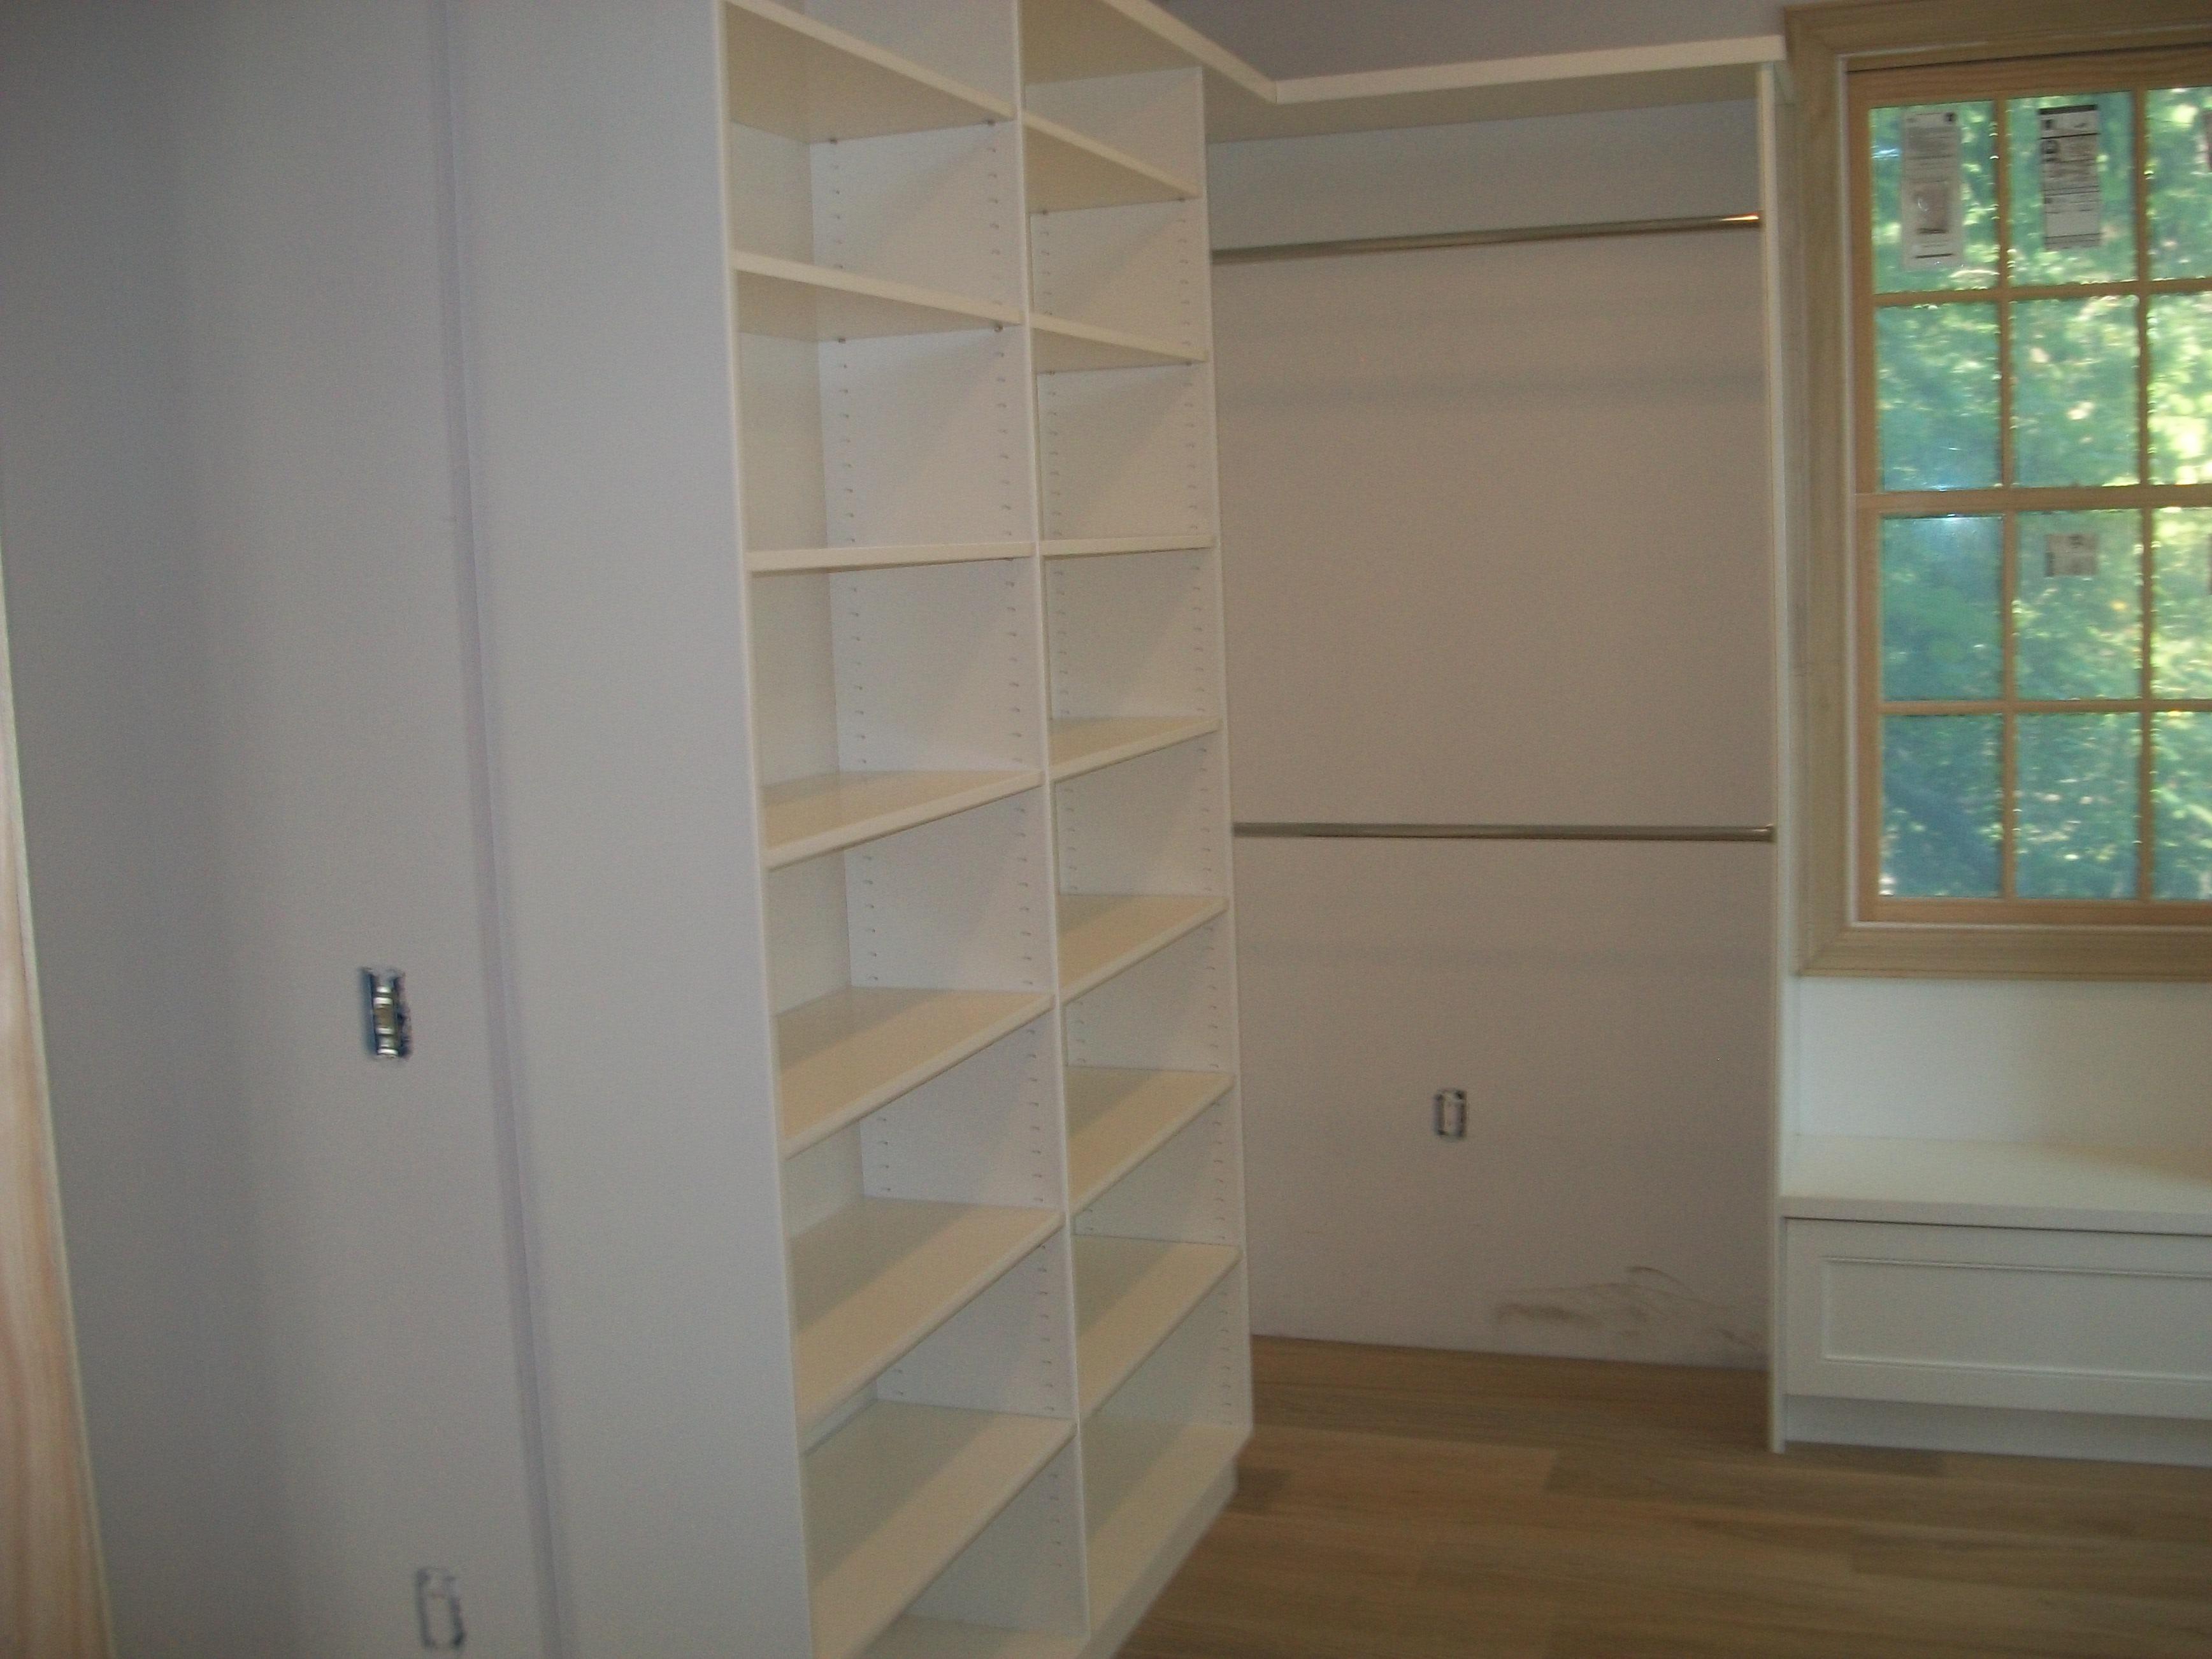 closets pant closet rack coco premier concrete custom garage cabinets flat walk organizers may in michigan sobelman panel angle